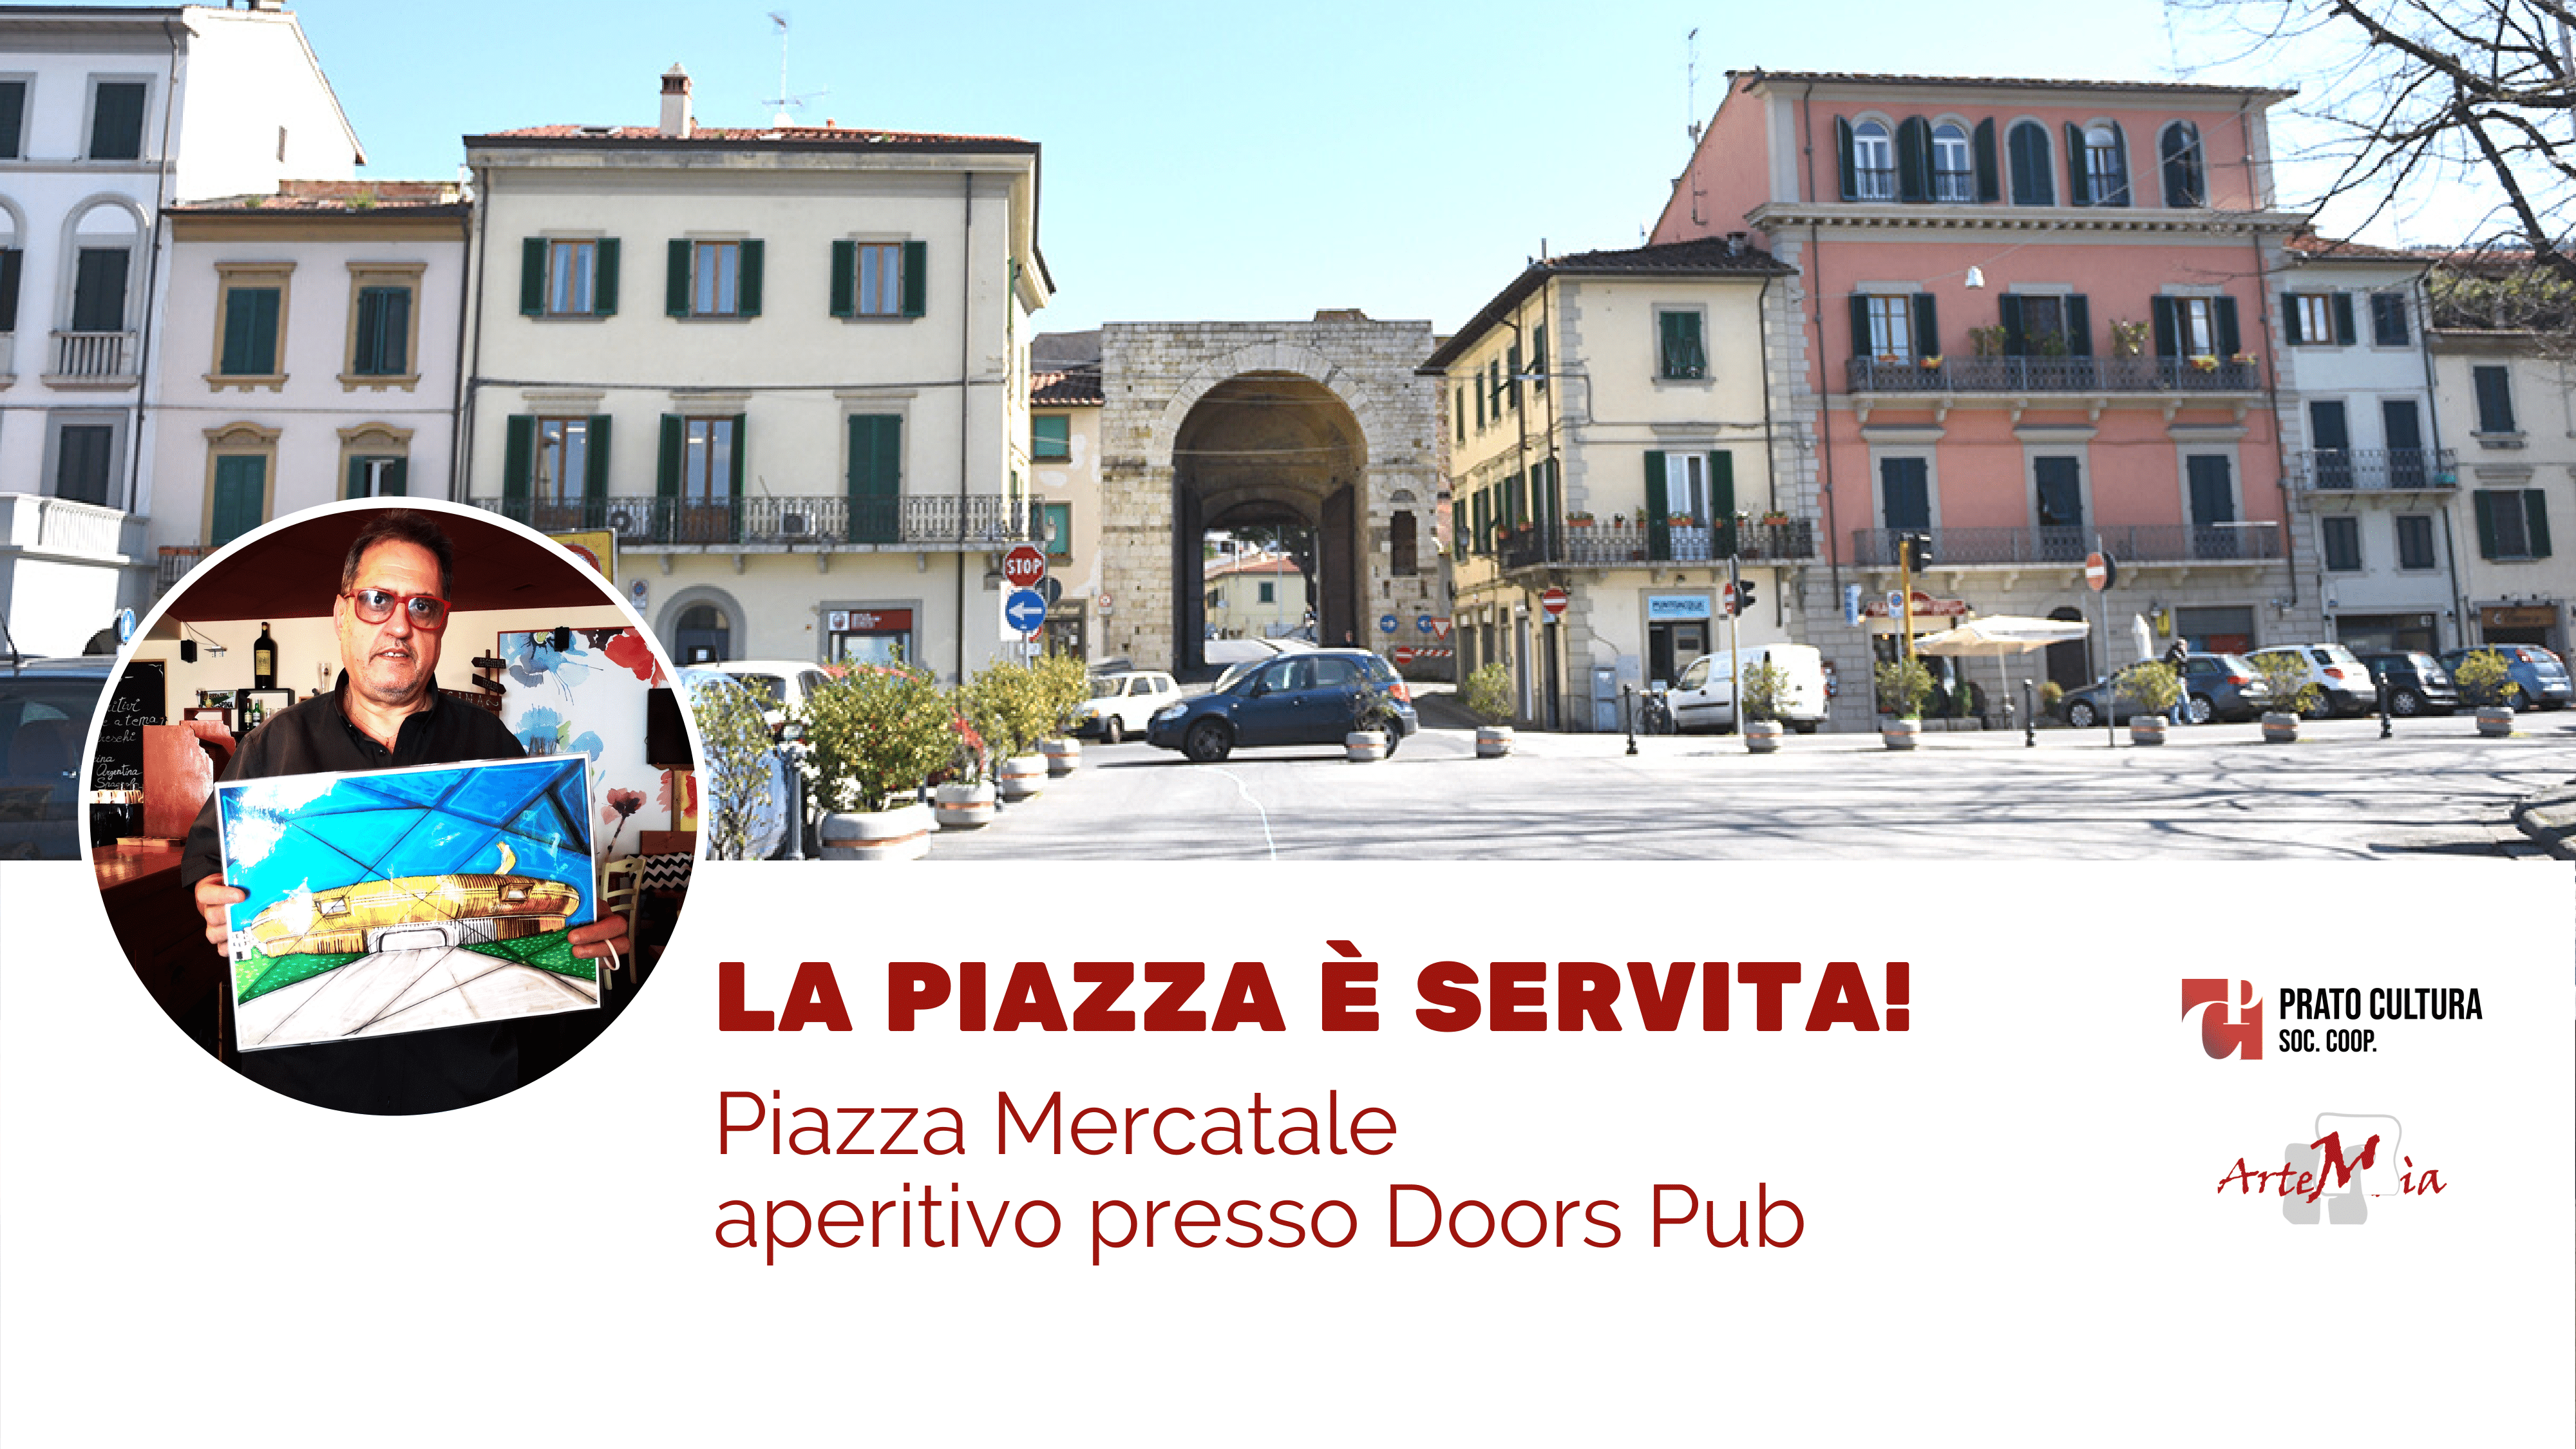 La piazza è servita! Piazza Mercatale - Doors Pub